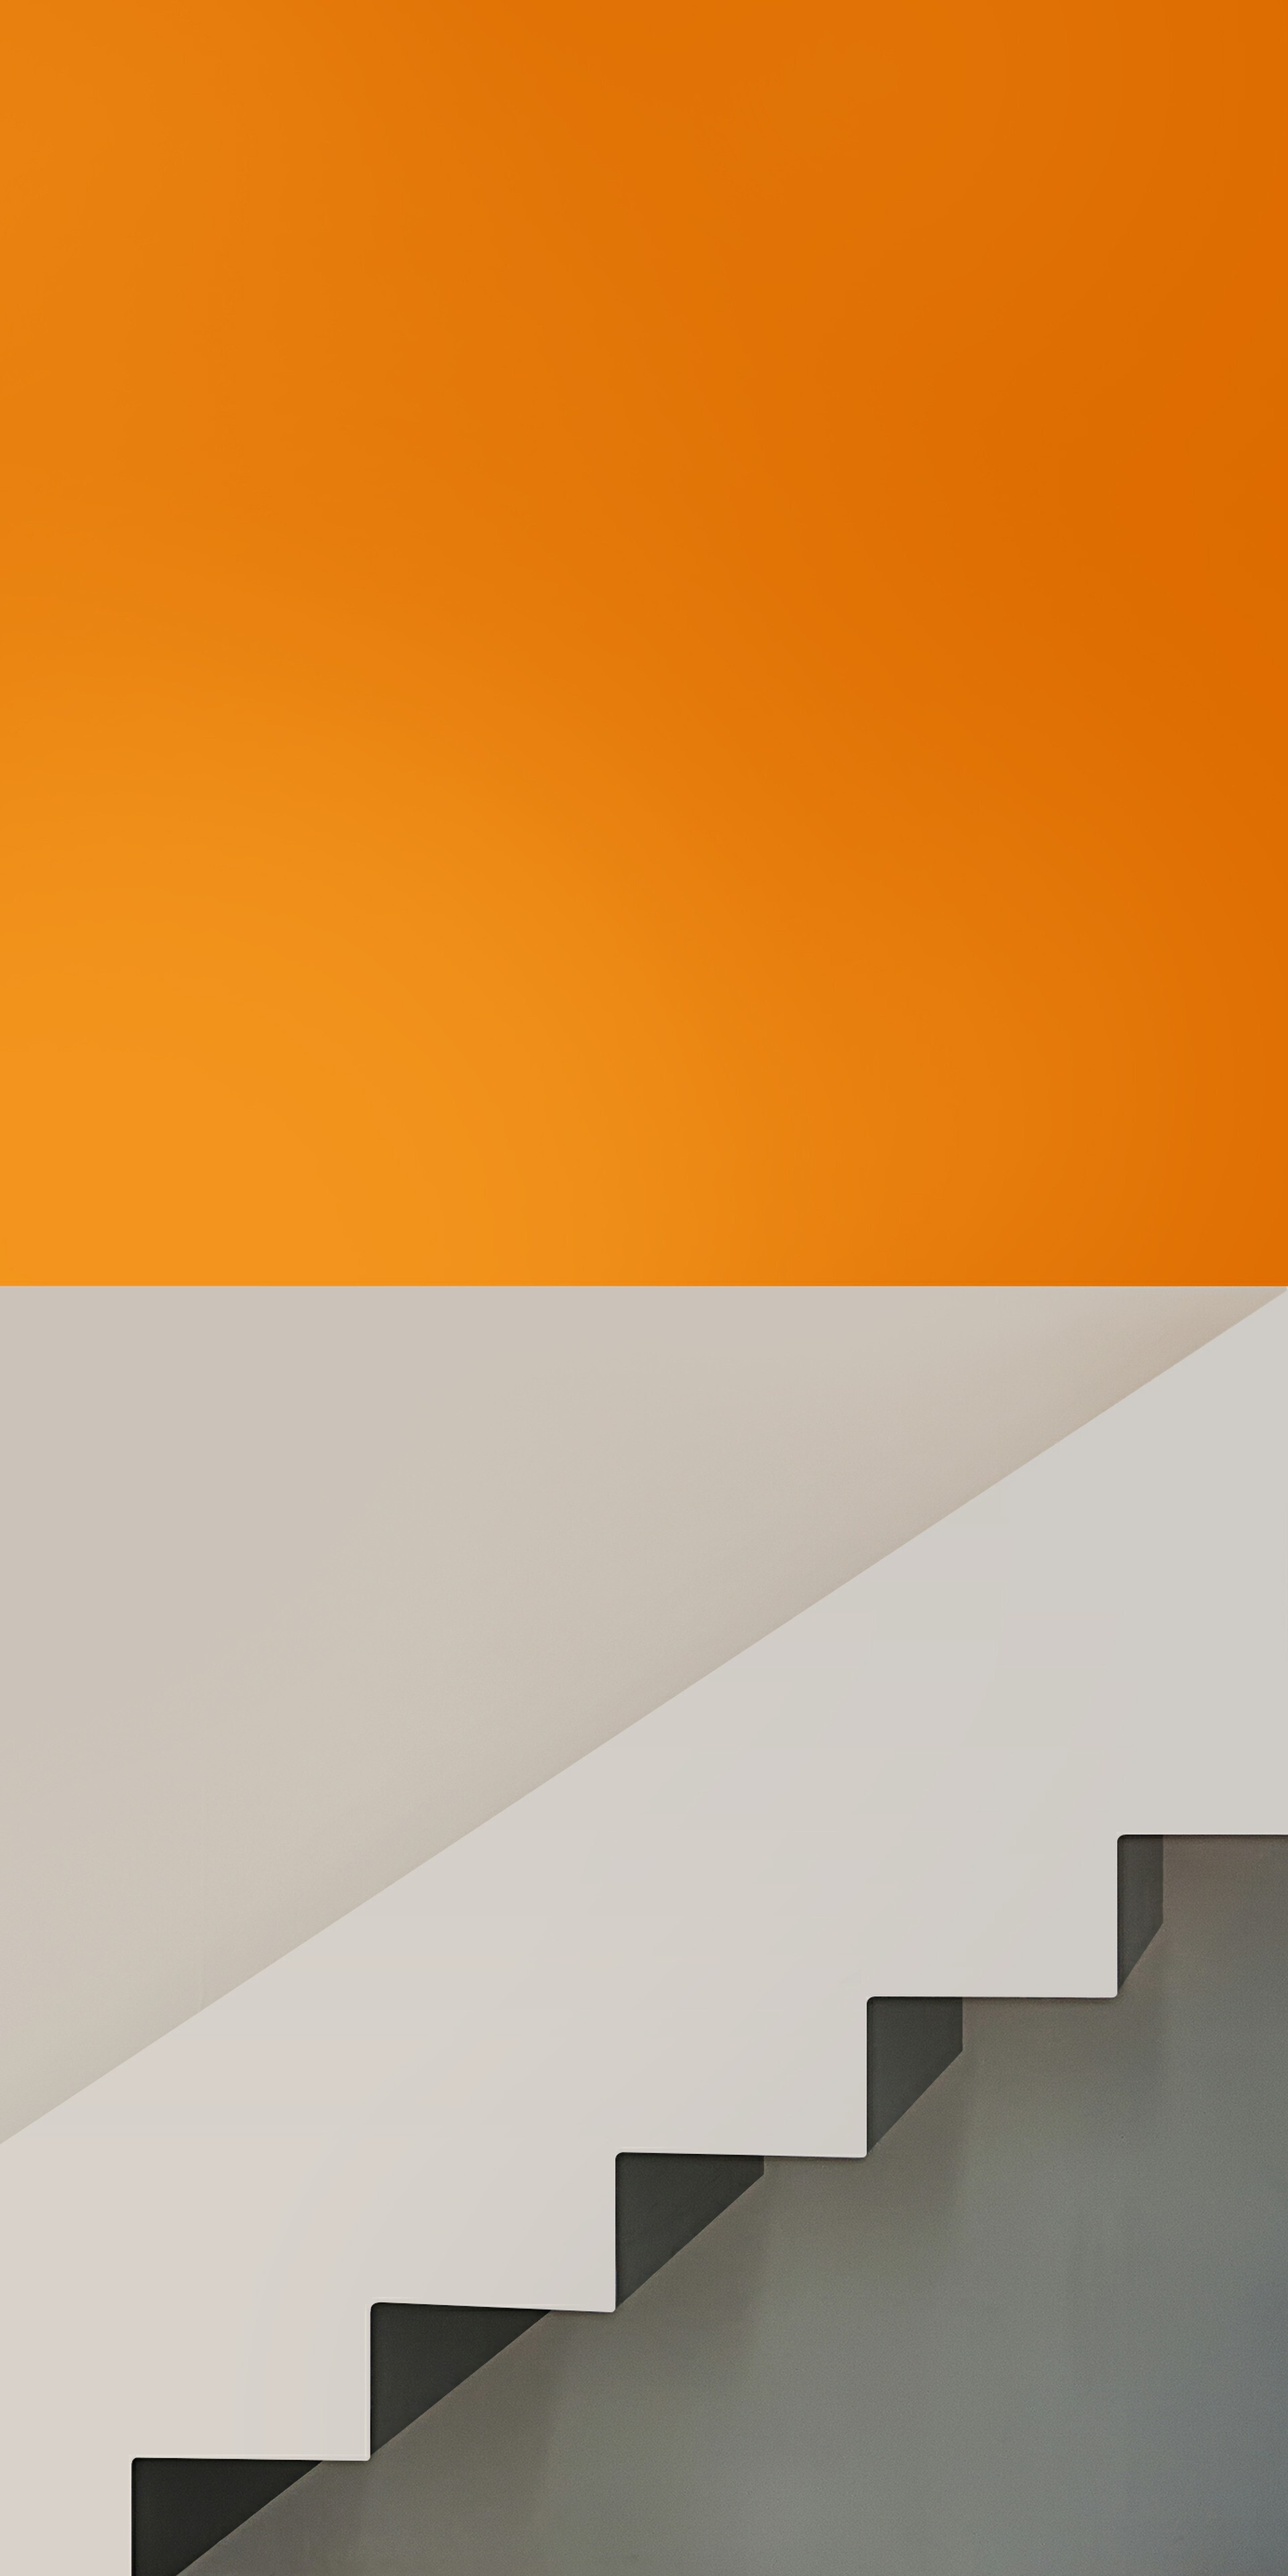 lg g4 wallpapers phonearena